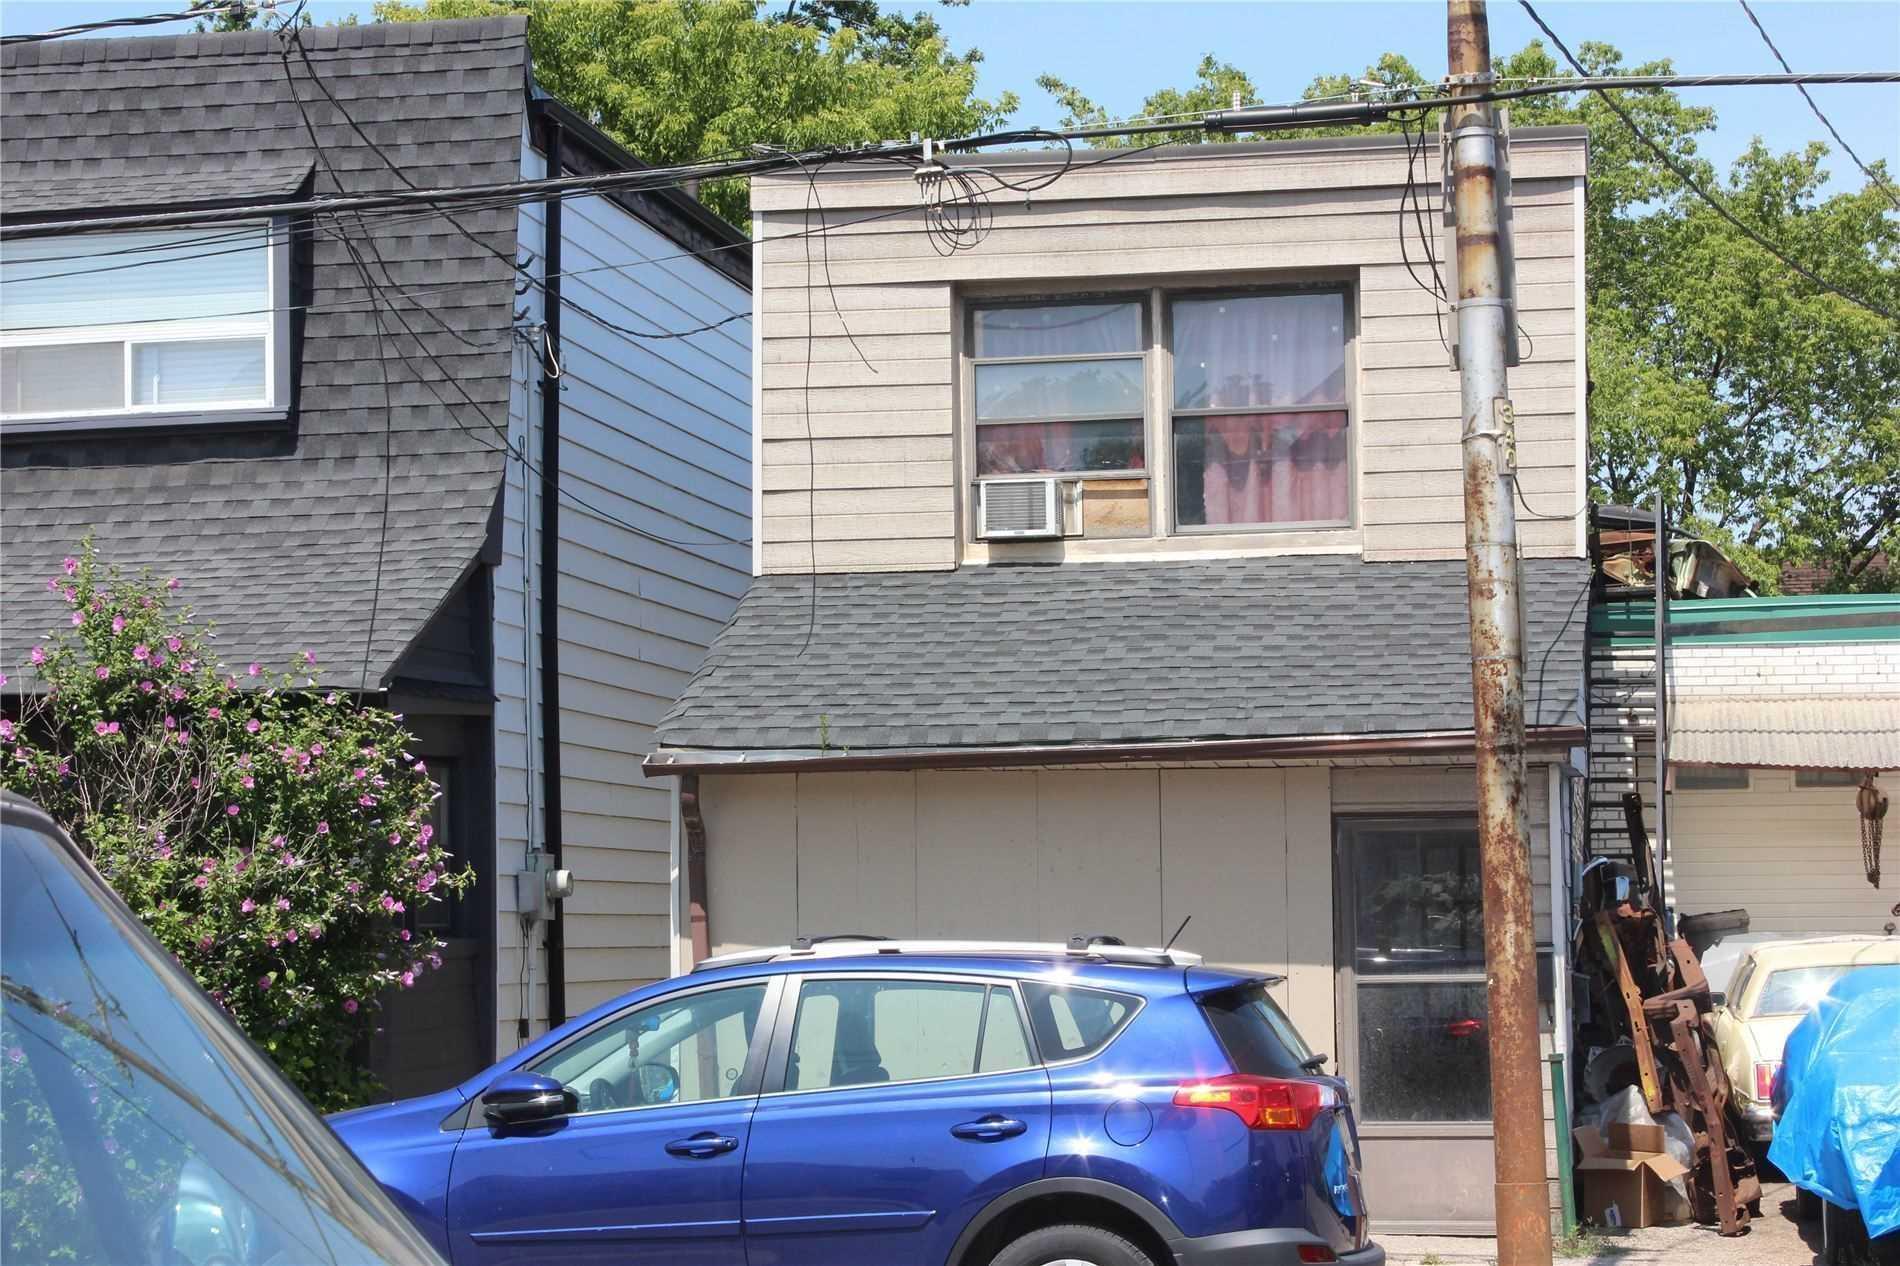 1074 Dupont St, Toronto, M6H1Z6